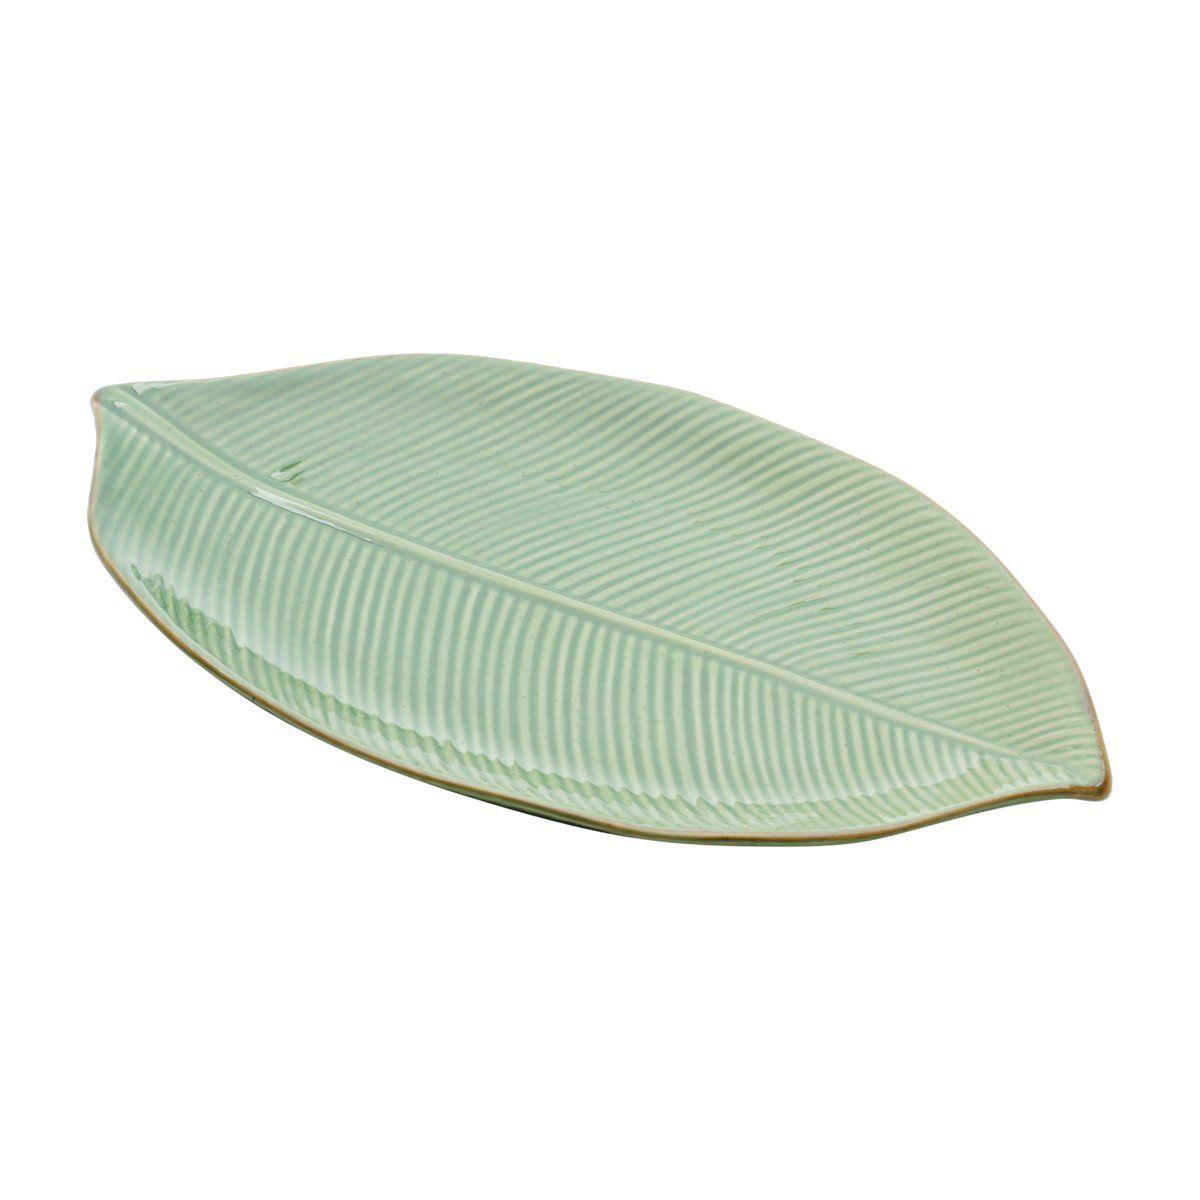 Prato decorativo 35,5 x 20,5 cm de cerâmica verde Banana Leaf Lyor - L4124